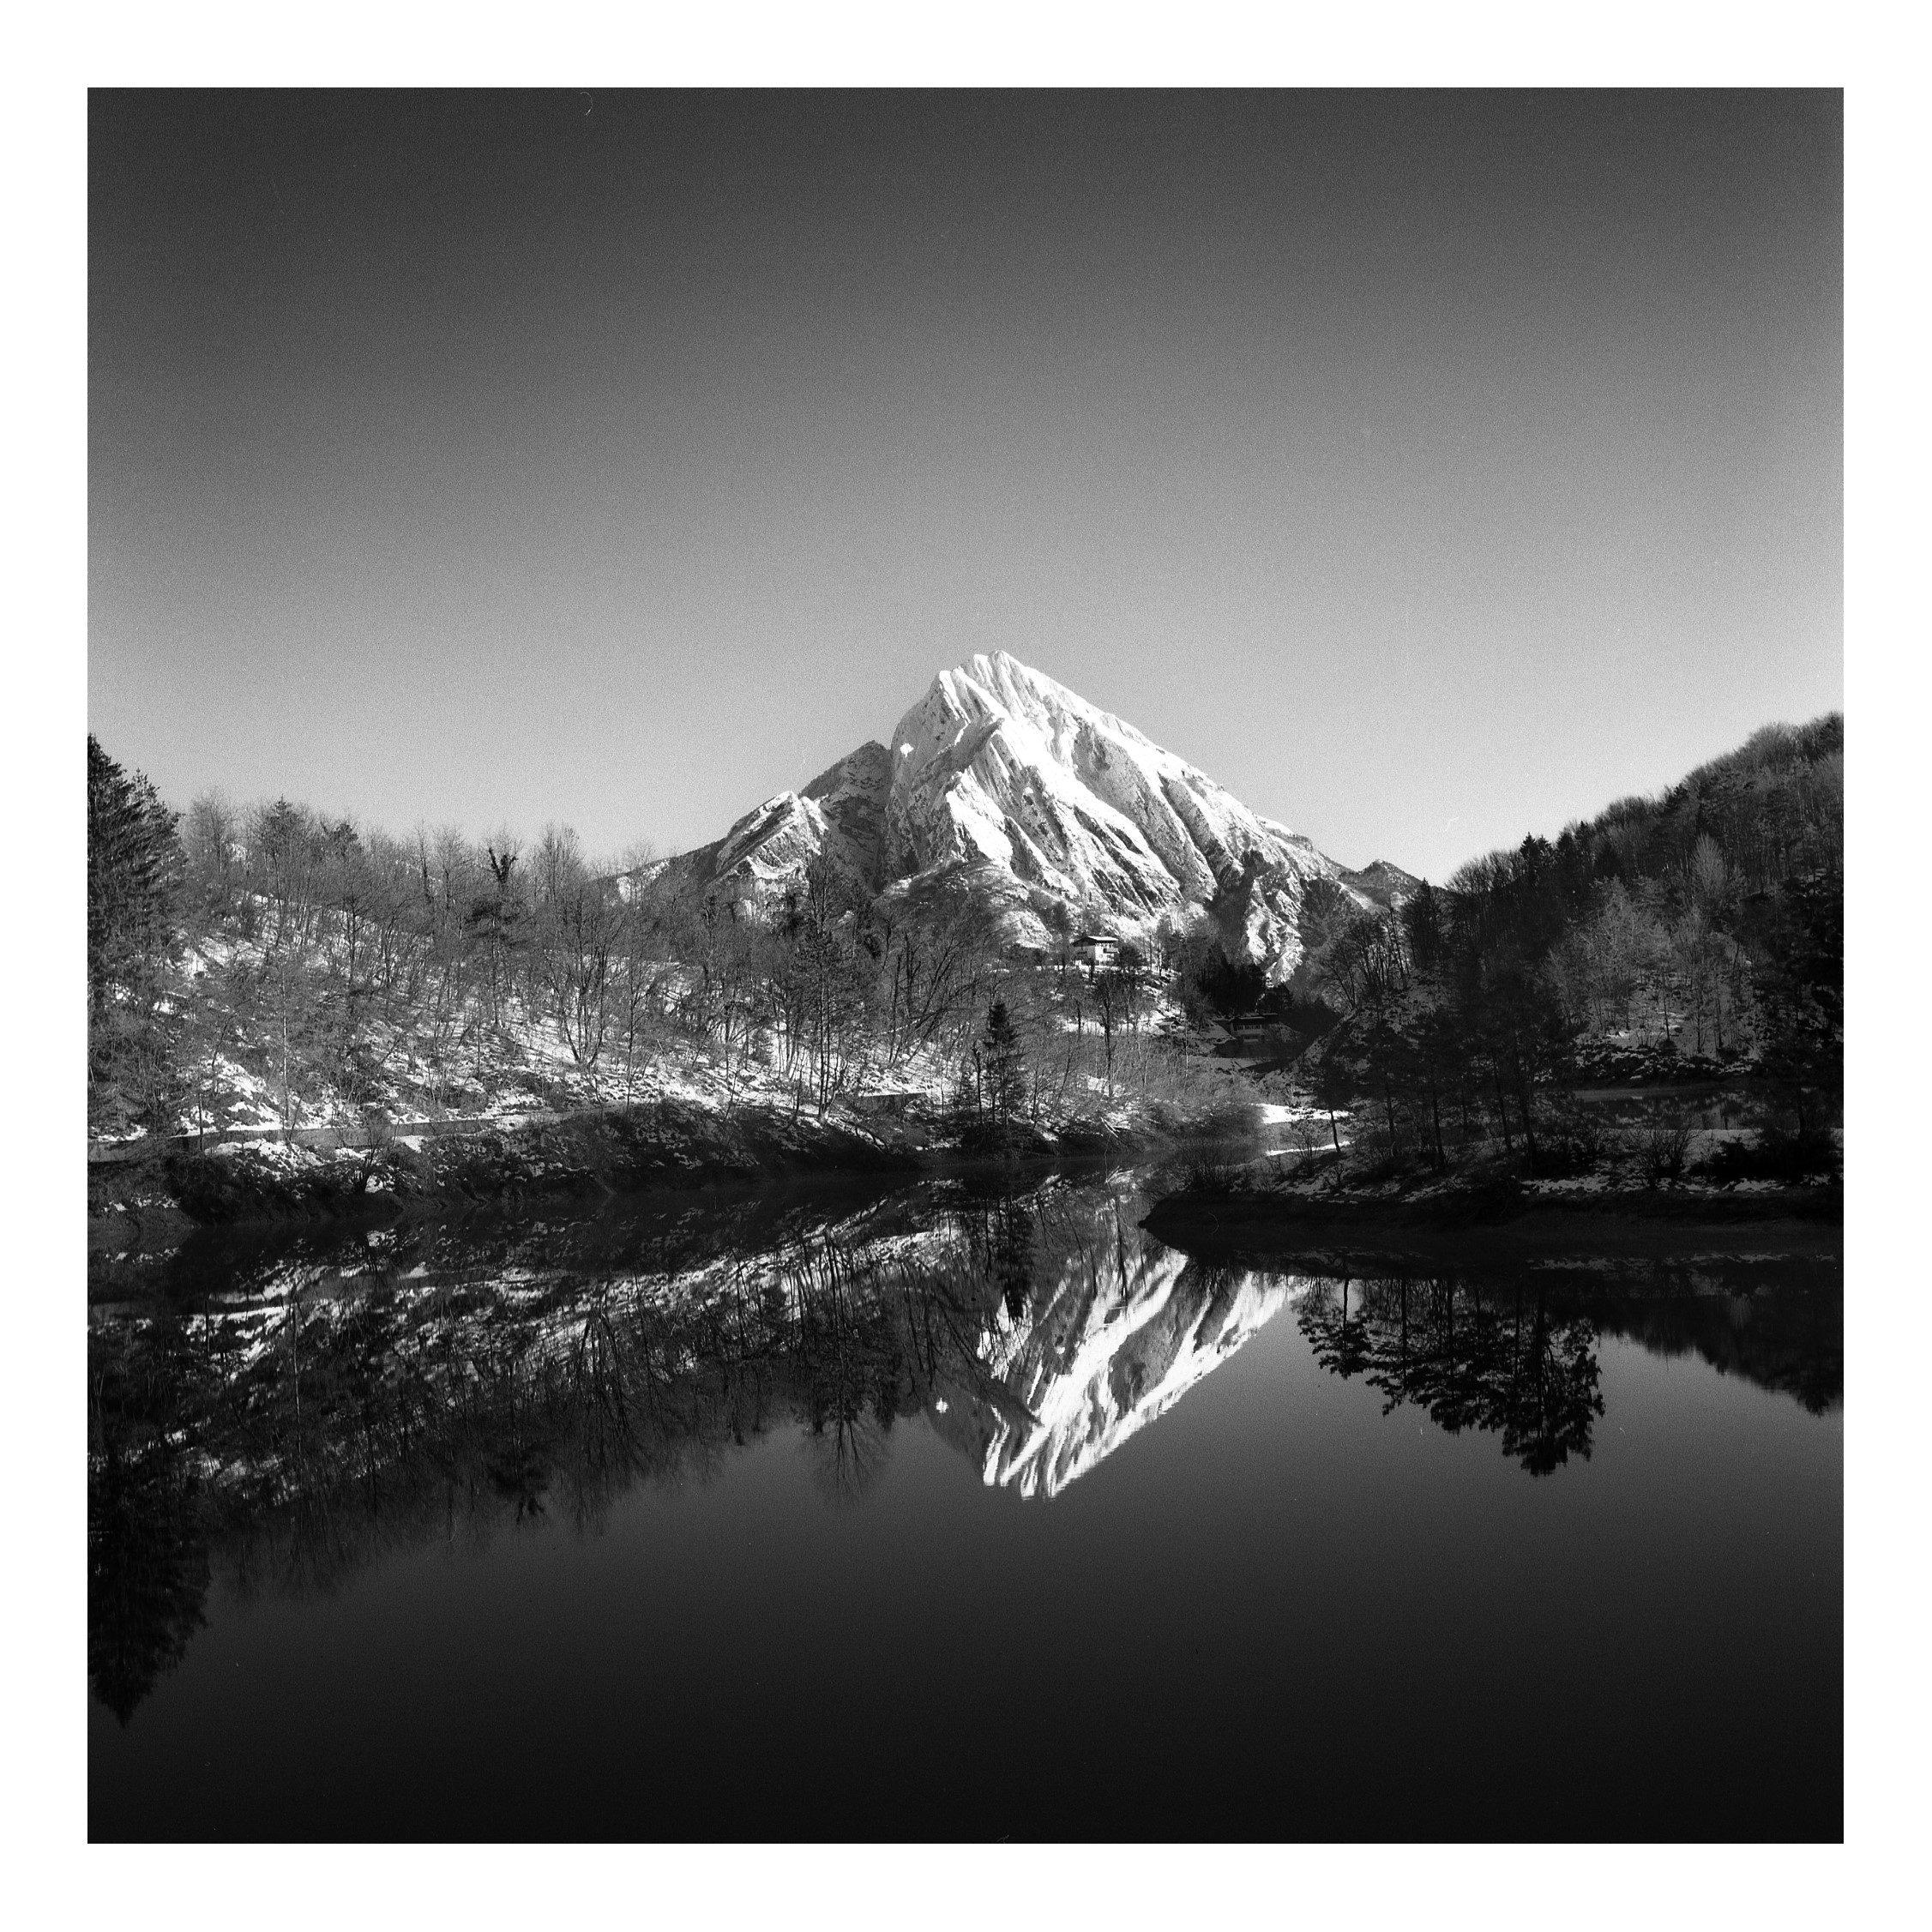 Amariana shot on DELTA 100 black and white film by Guido Maraconi